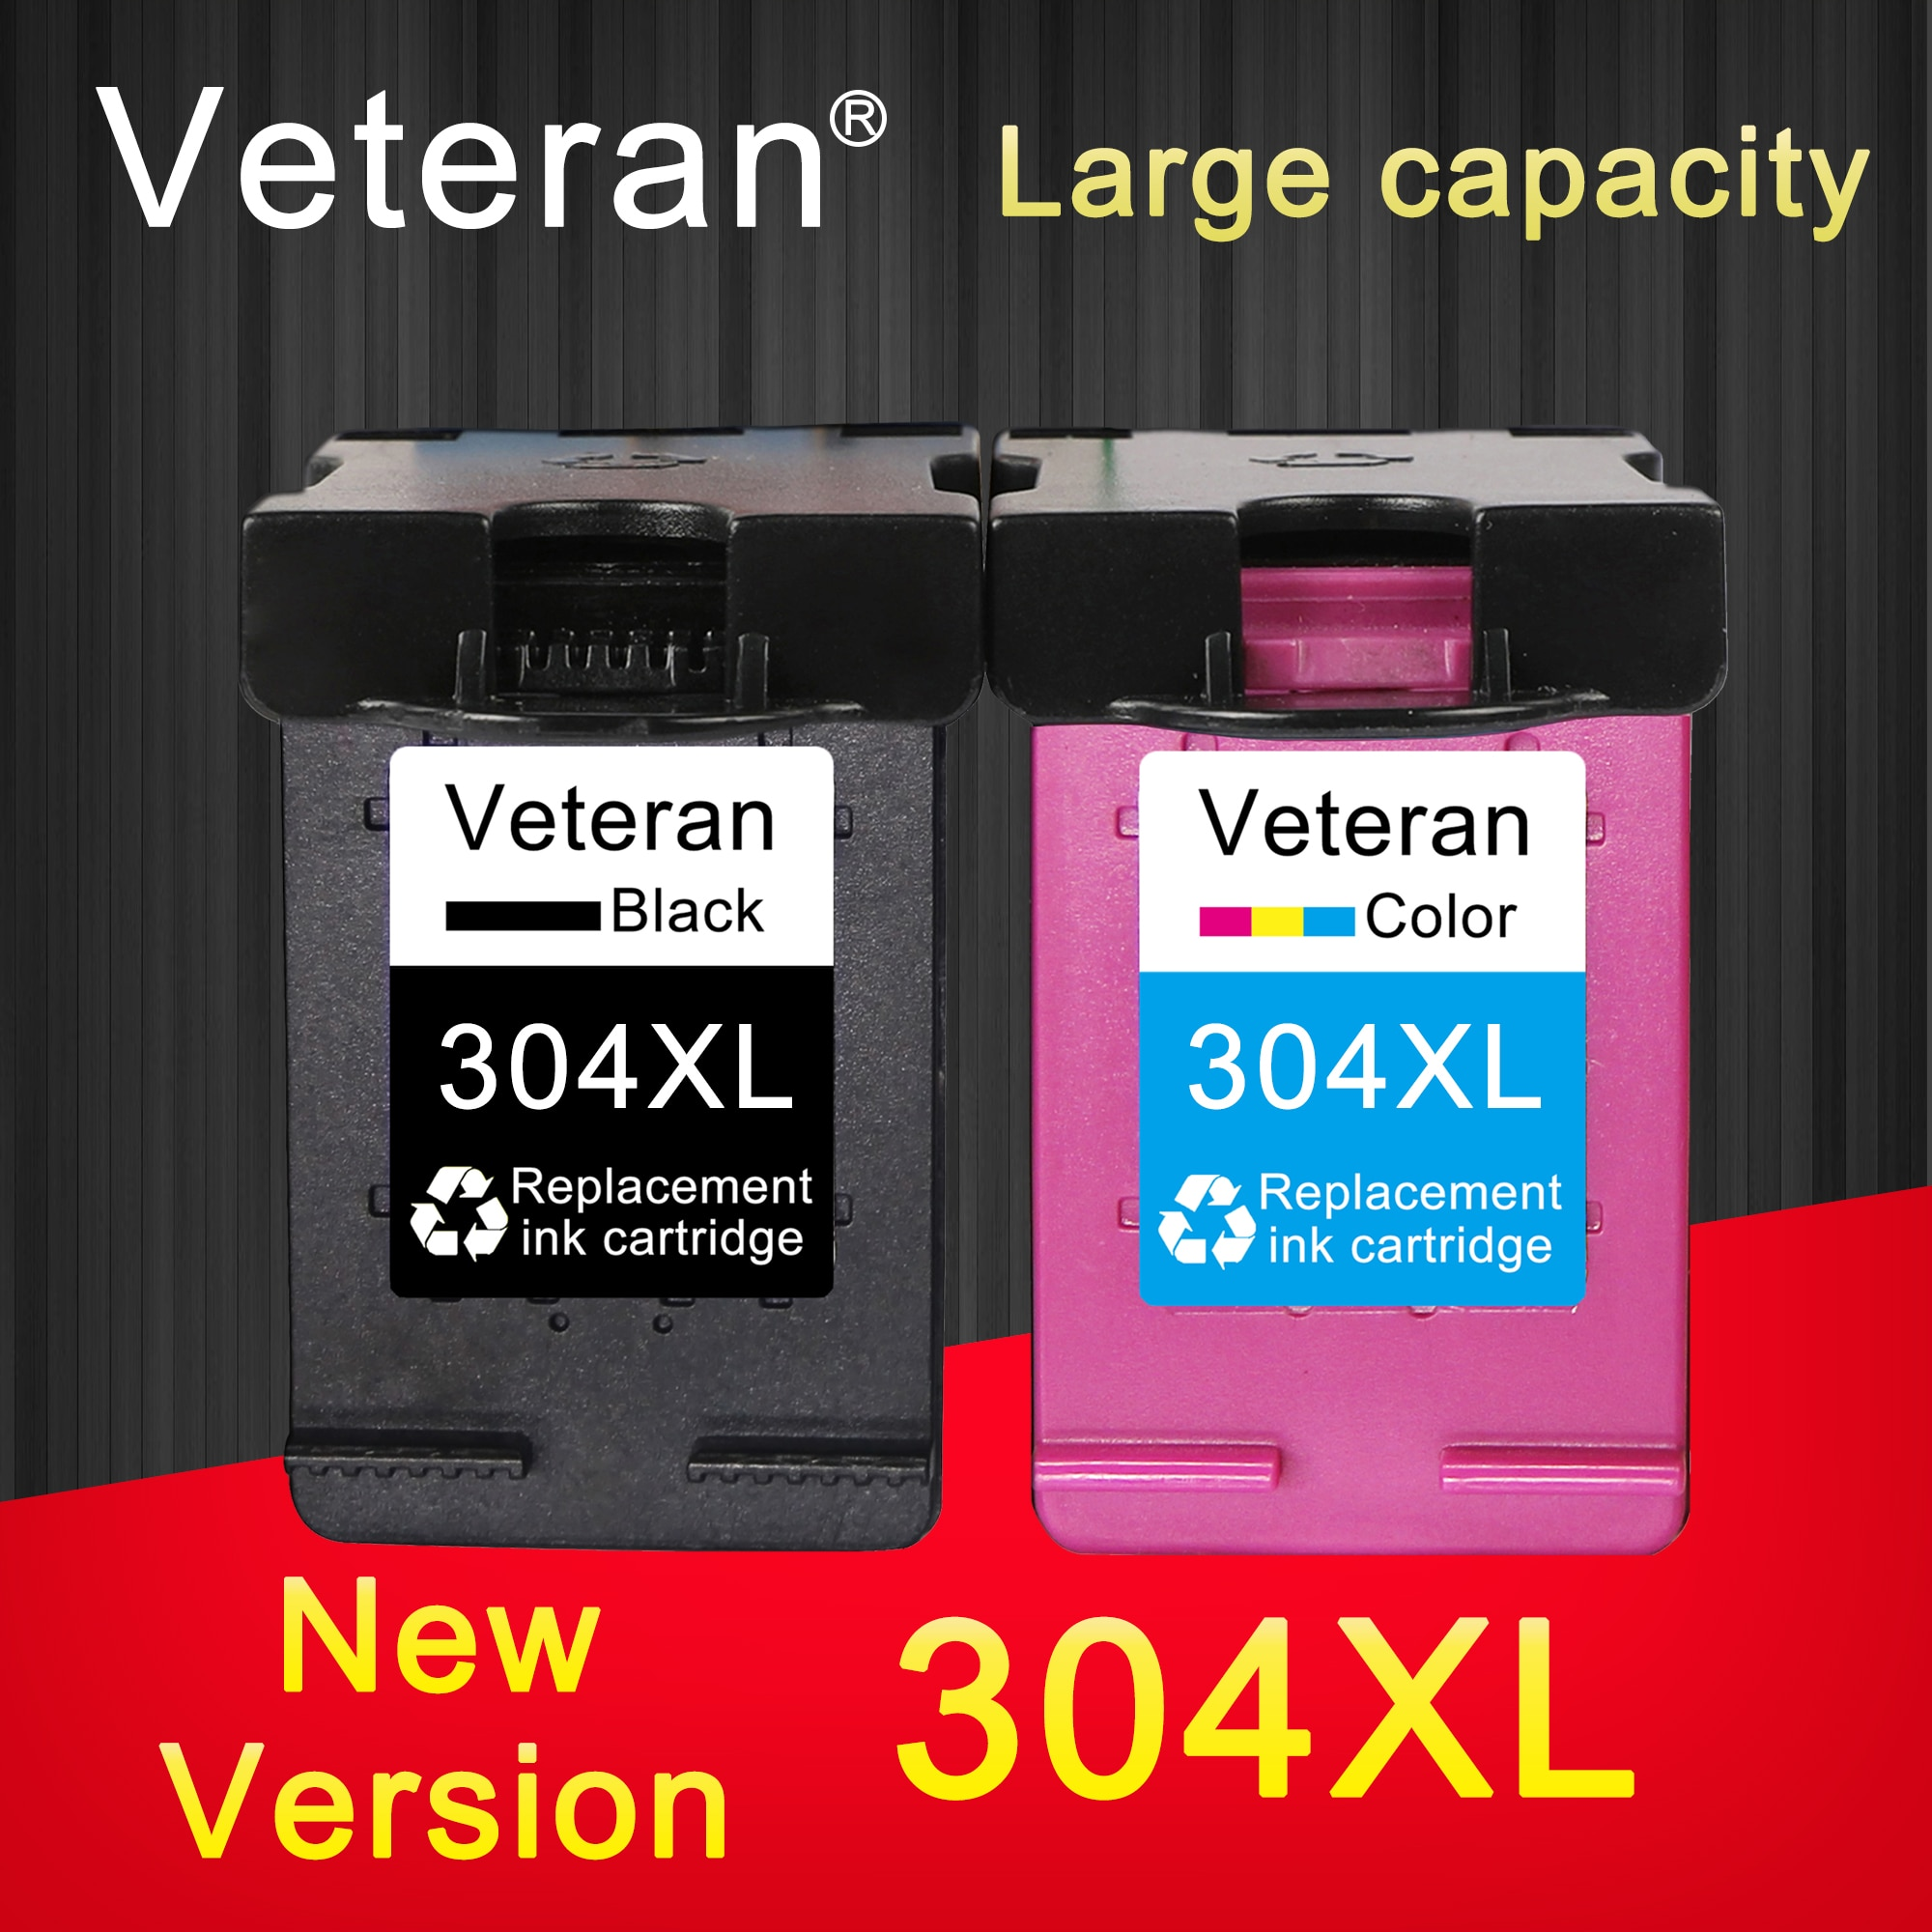 Veteran Ink Cartridge 304XL new version for hp304 hp 304 xl deskjet envy 2620 2630 2632 5030 5020 5032 3720 3730 5010 printer